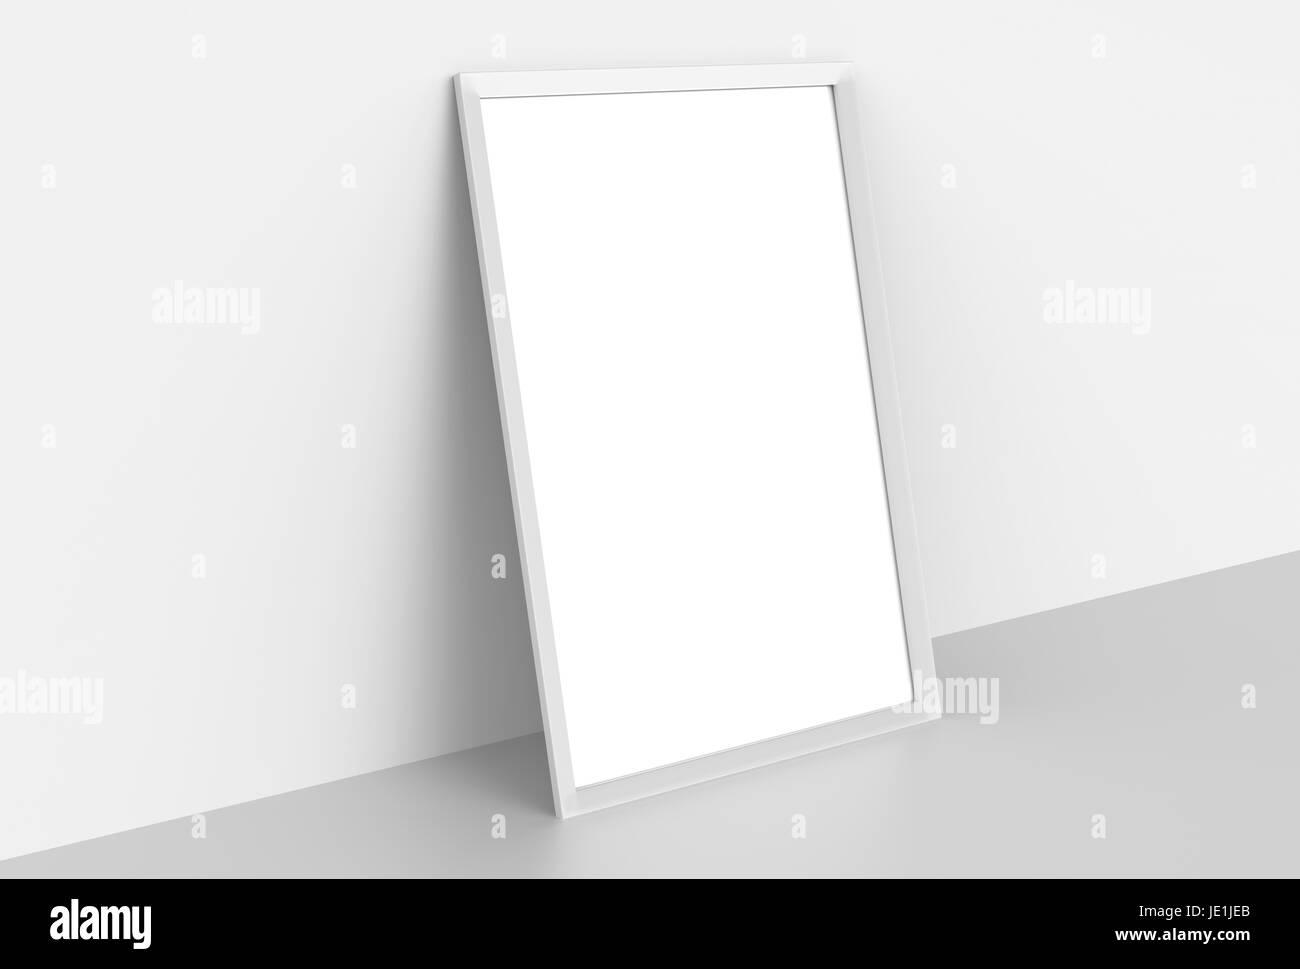 Realistic Blank Mock Up Poster Imágenes De Stock & Realistic Blank ...